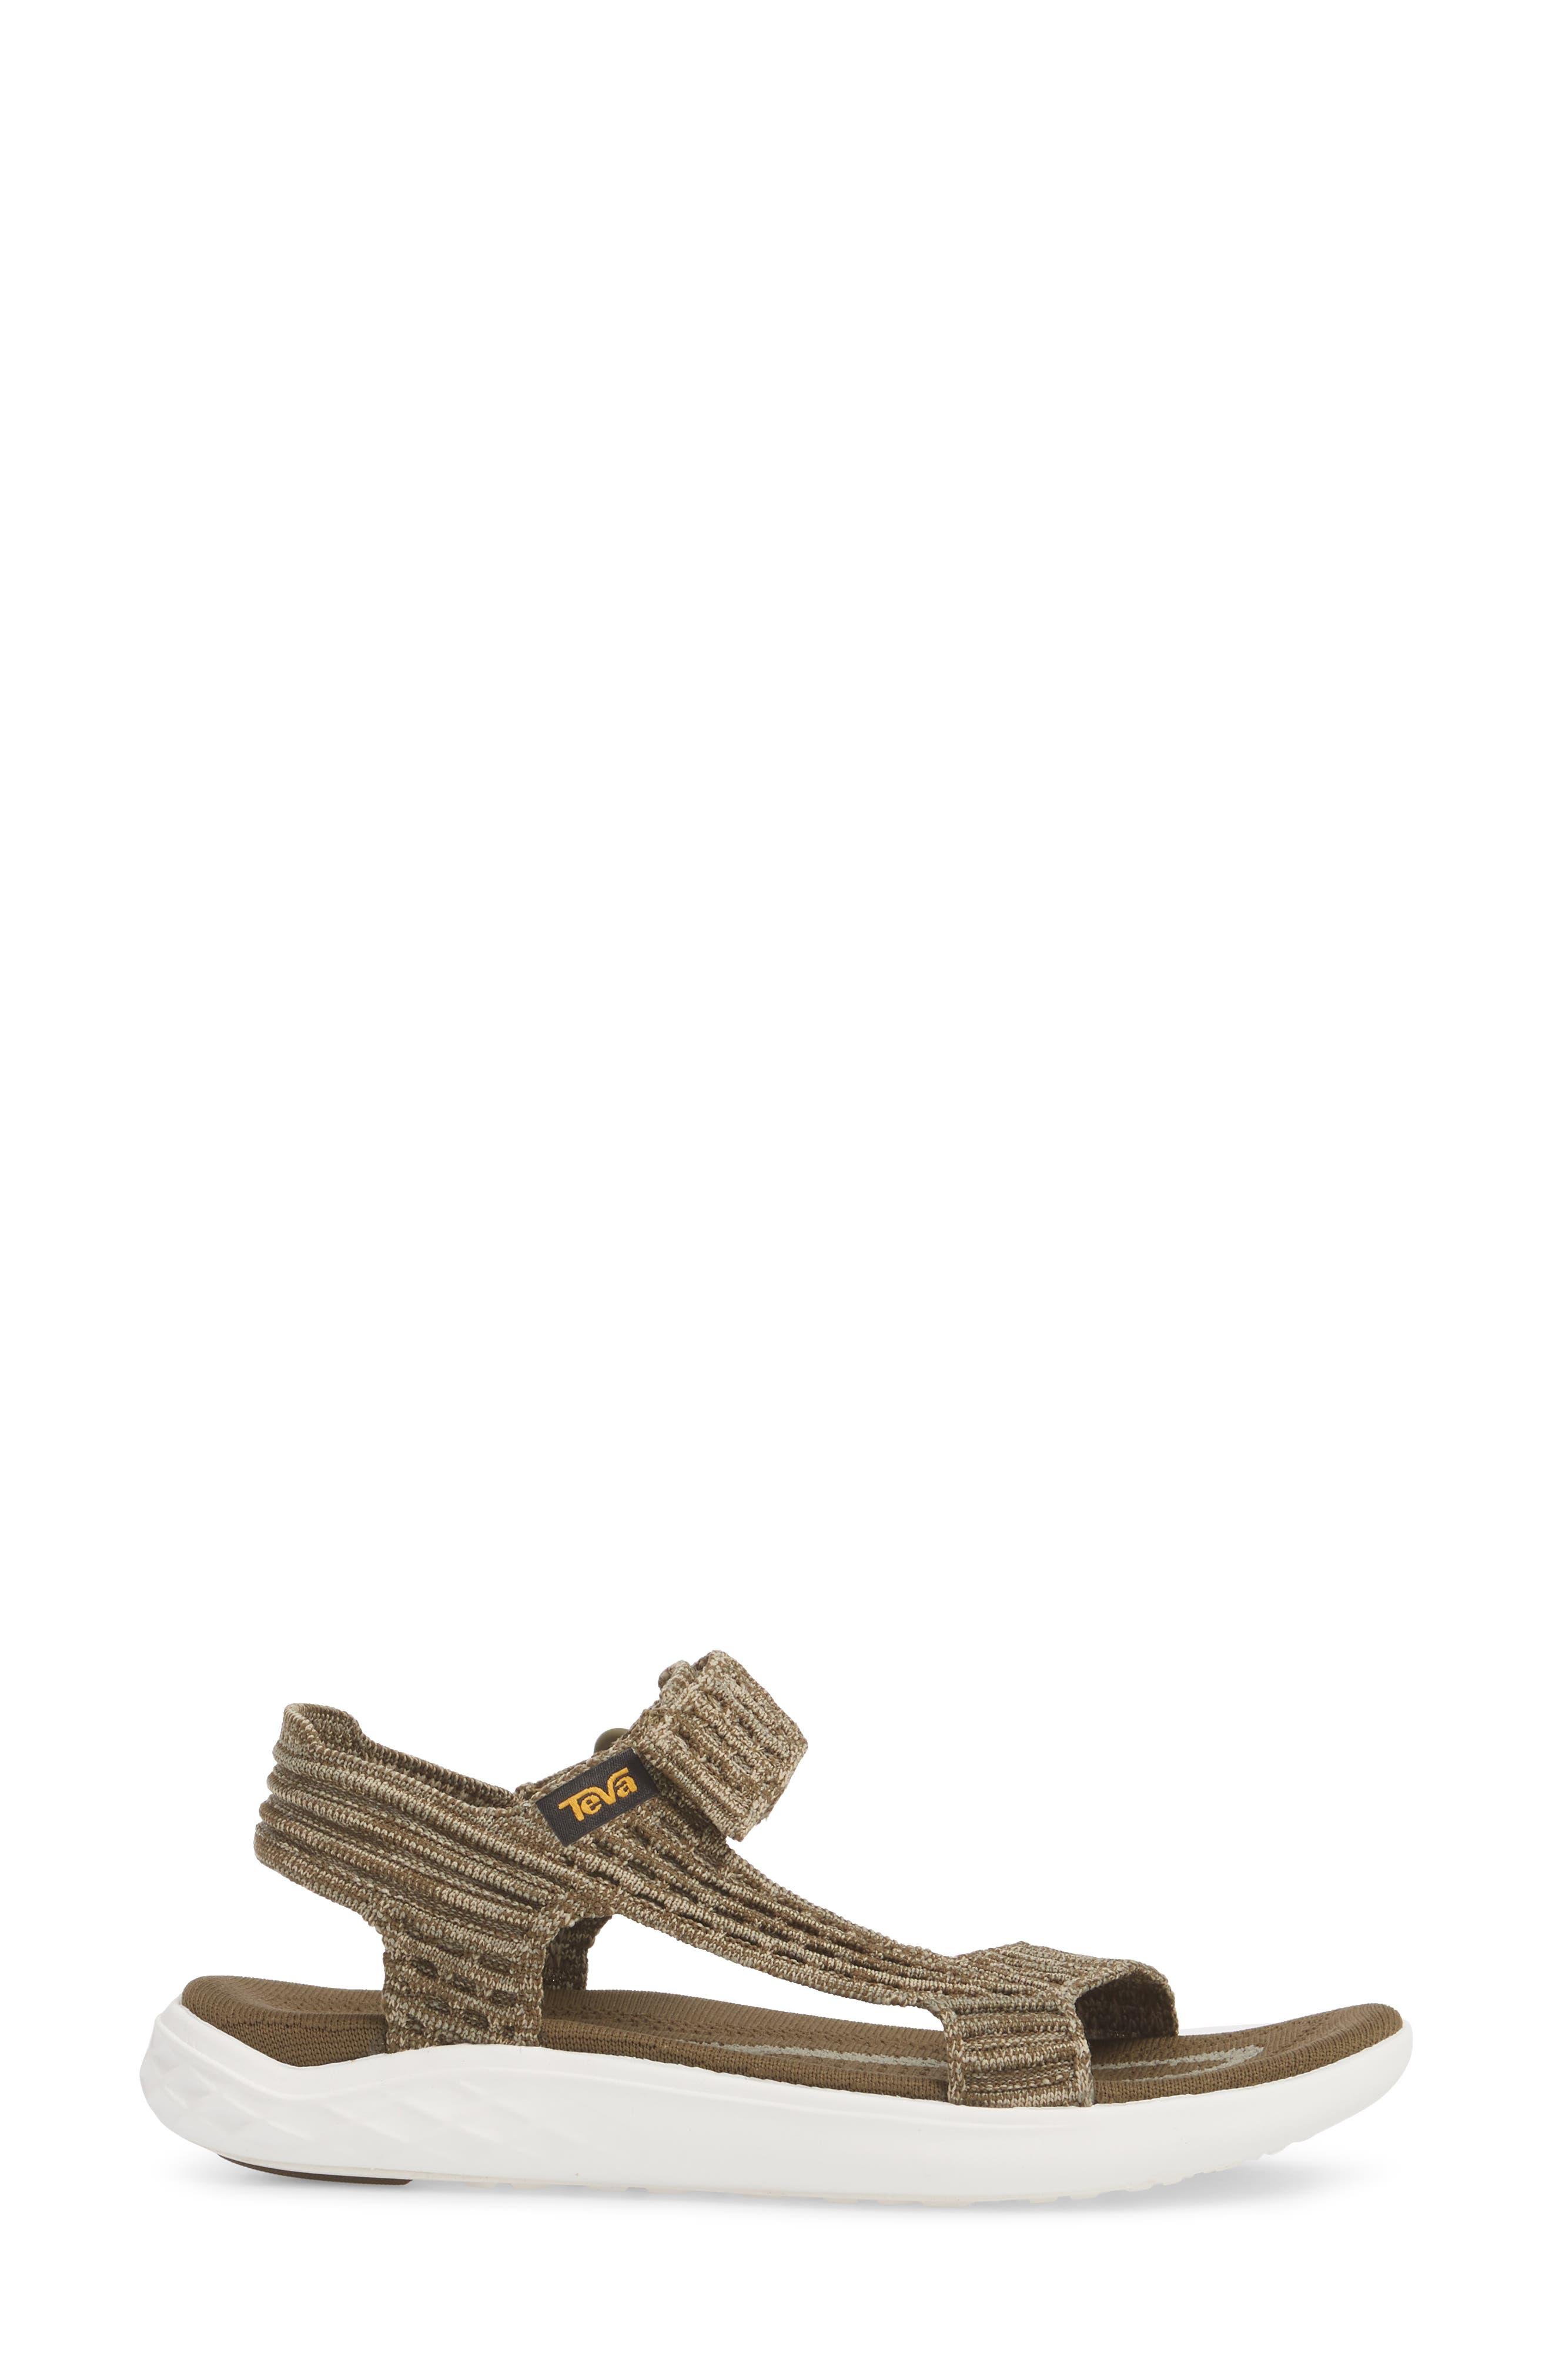 Terra Float 2 Knit Universal Sandal,                             Alternate thumbnail 11, color,